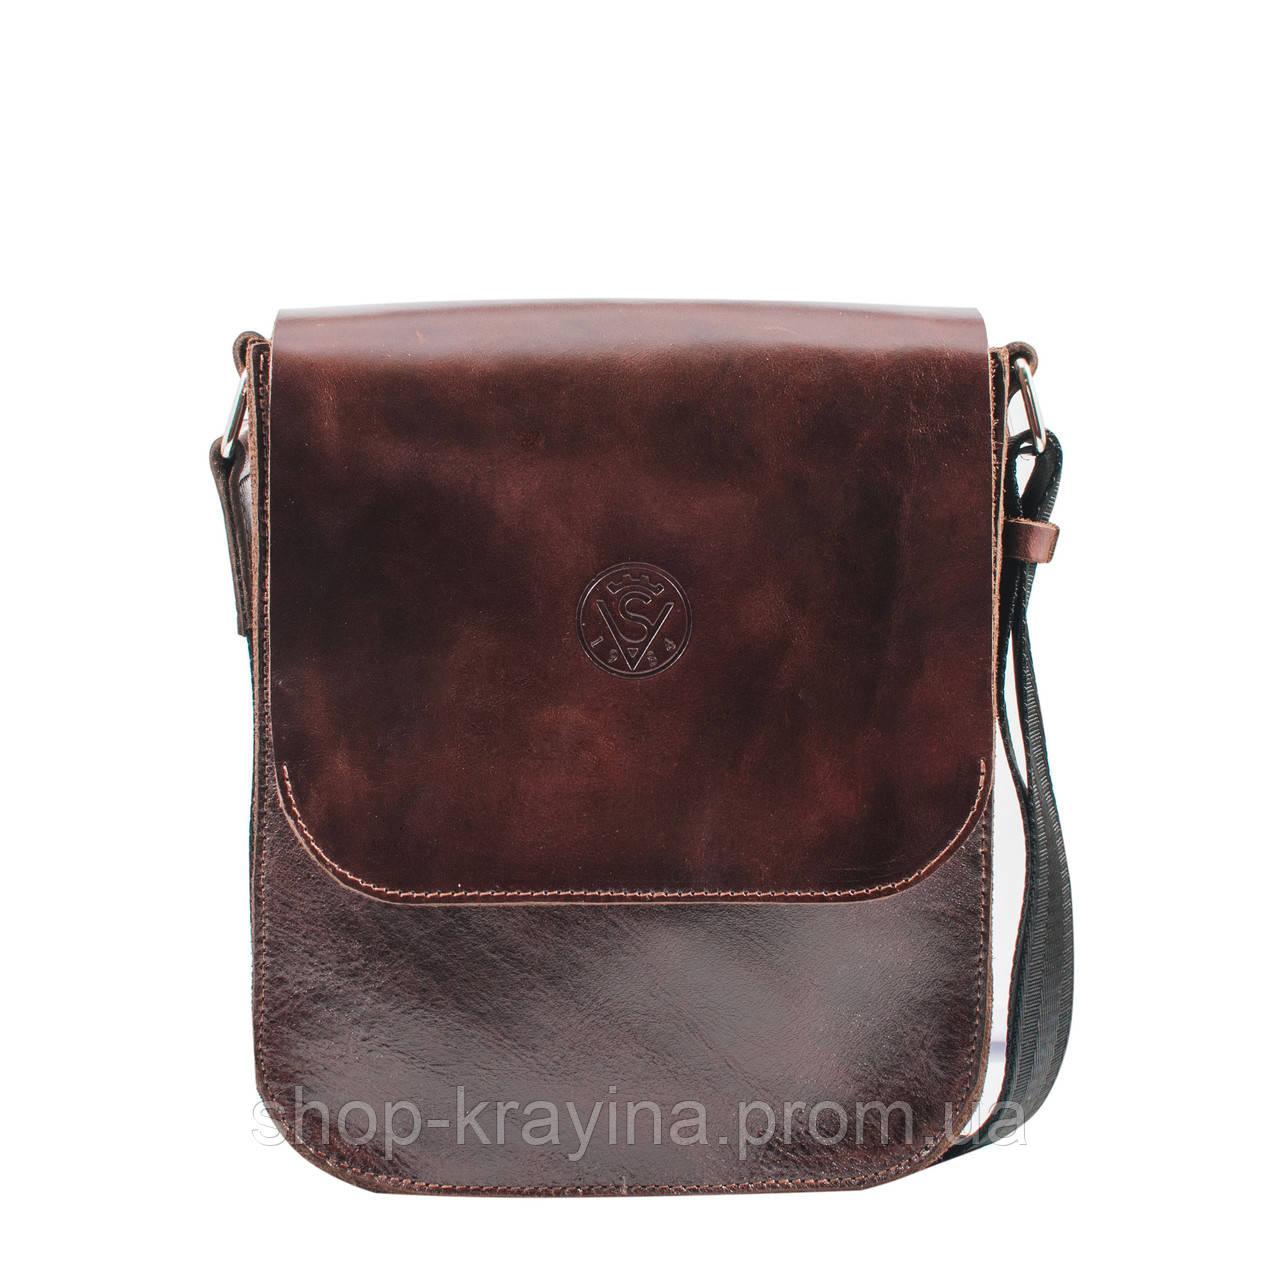 eae1c377b196 Кожаная мужская сумка VS214 brown gloss 20х23х5.5 см - Интернет магазин  сумок, обуви